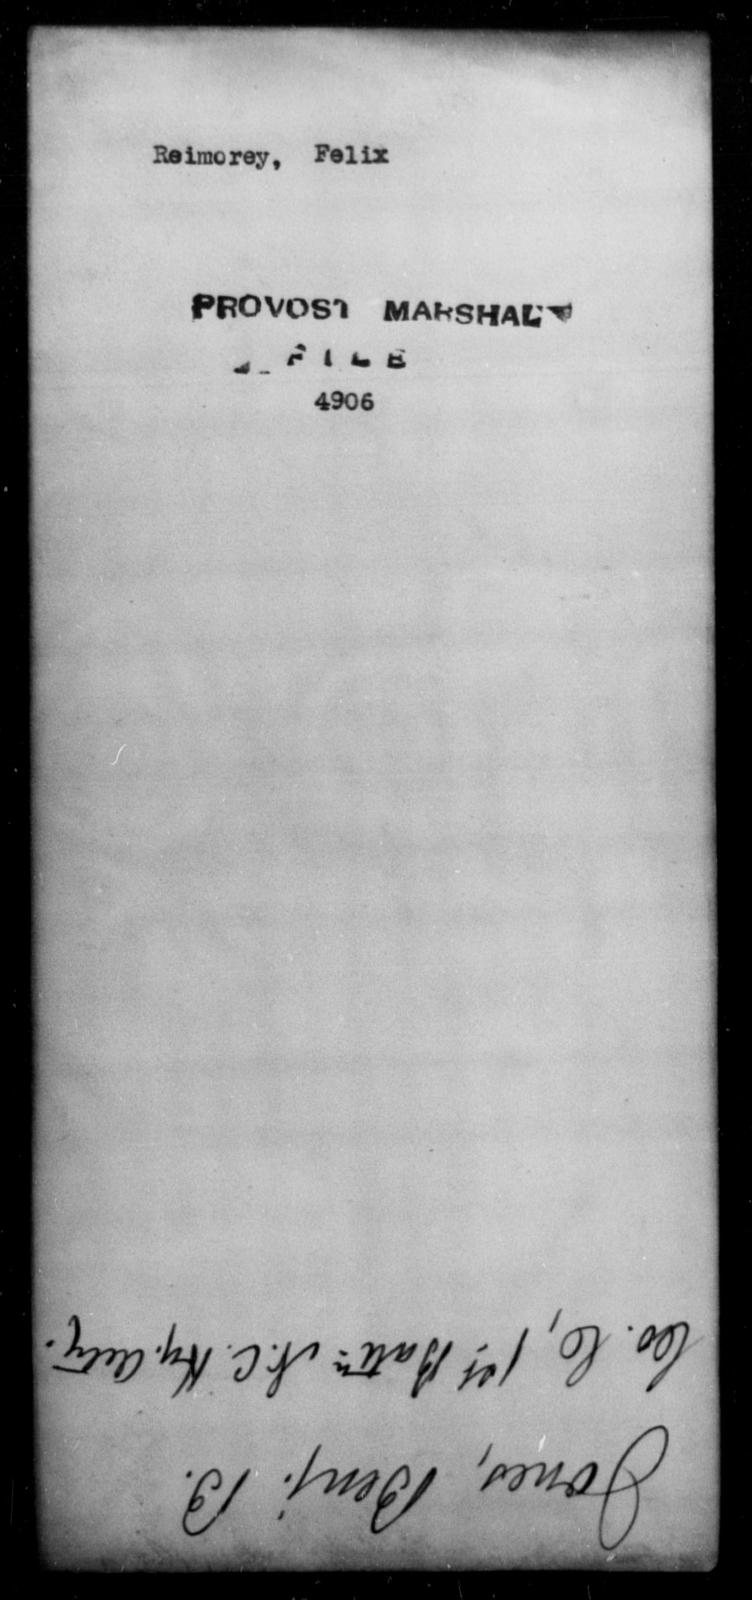 Reimorey, Felix - State: [Blank] - Year: [Blank]